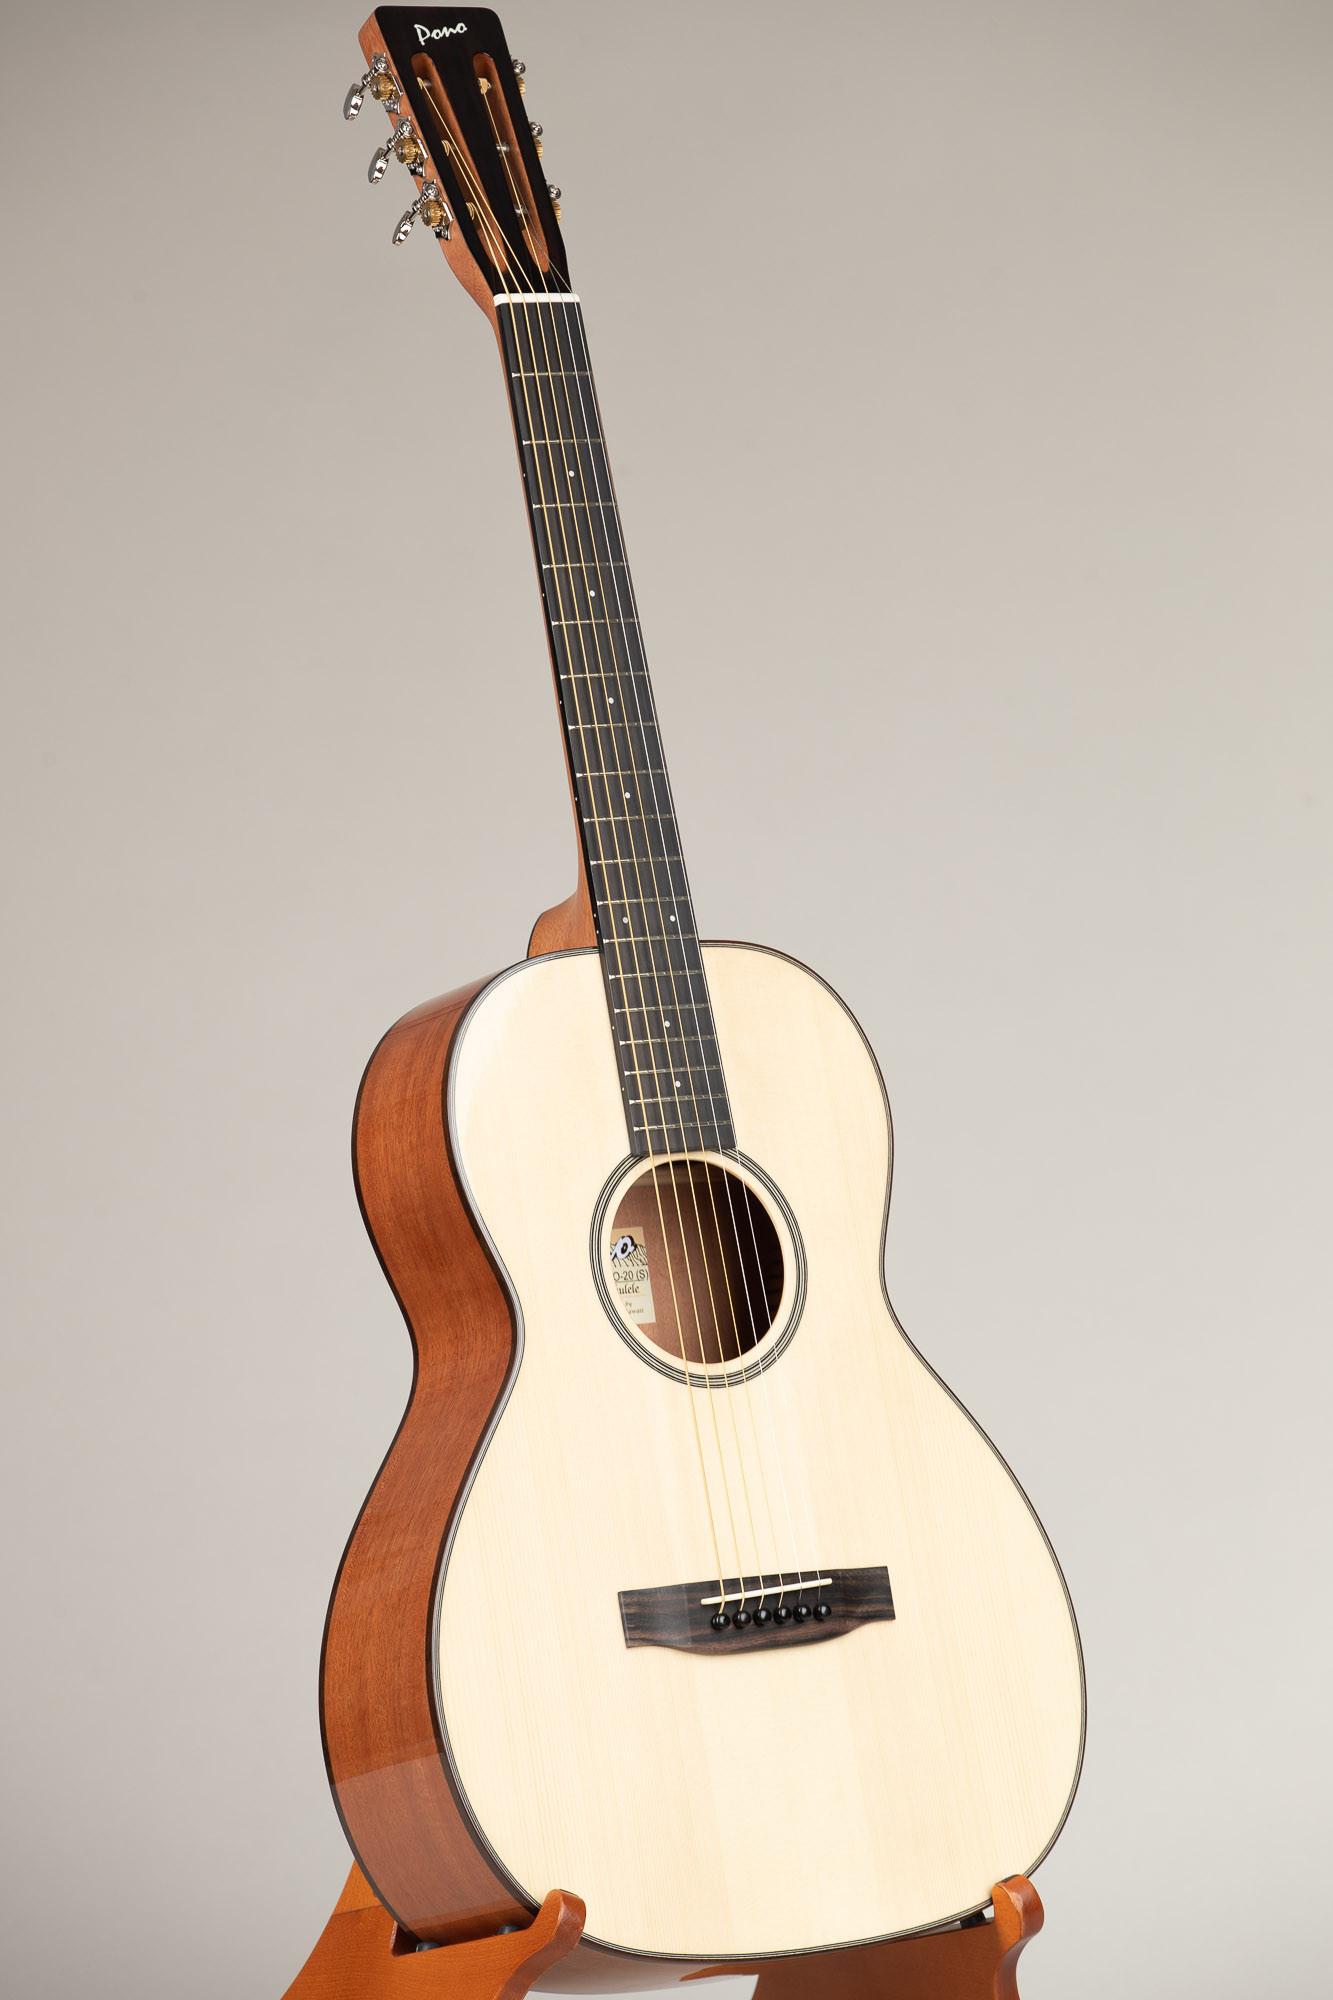 Pono Spruce Top Mahogany OO Guitar (OO-20S 2988)